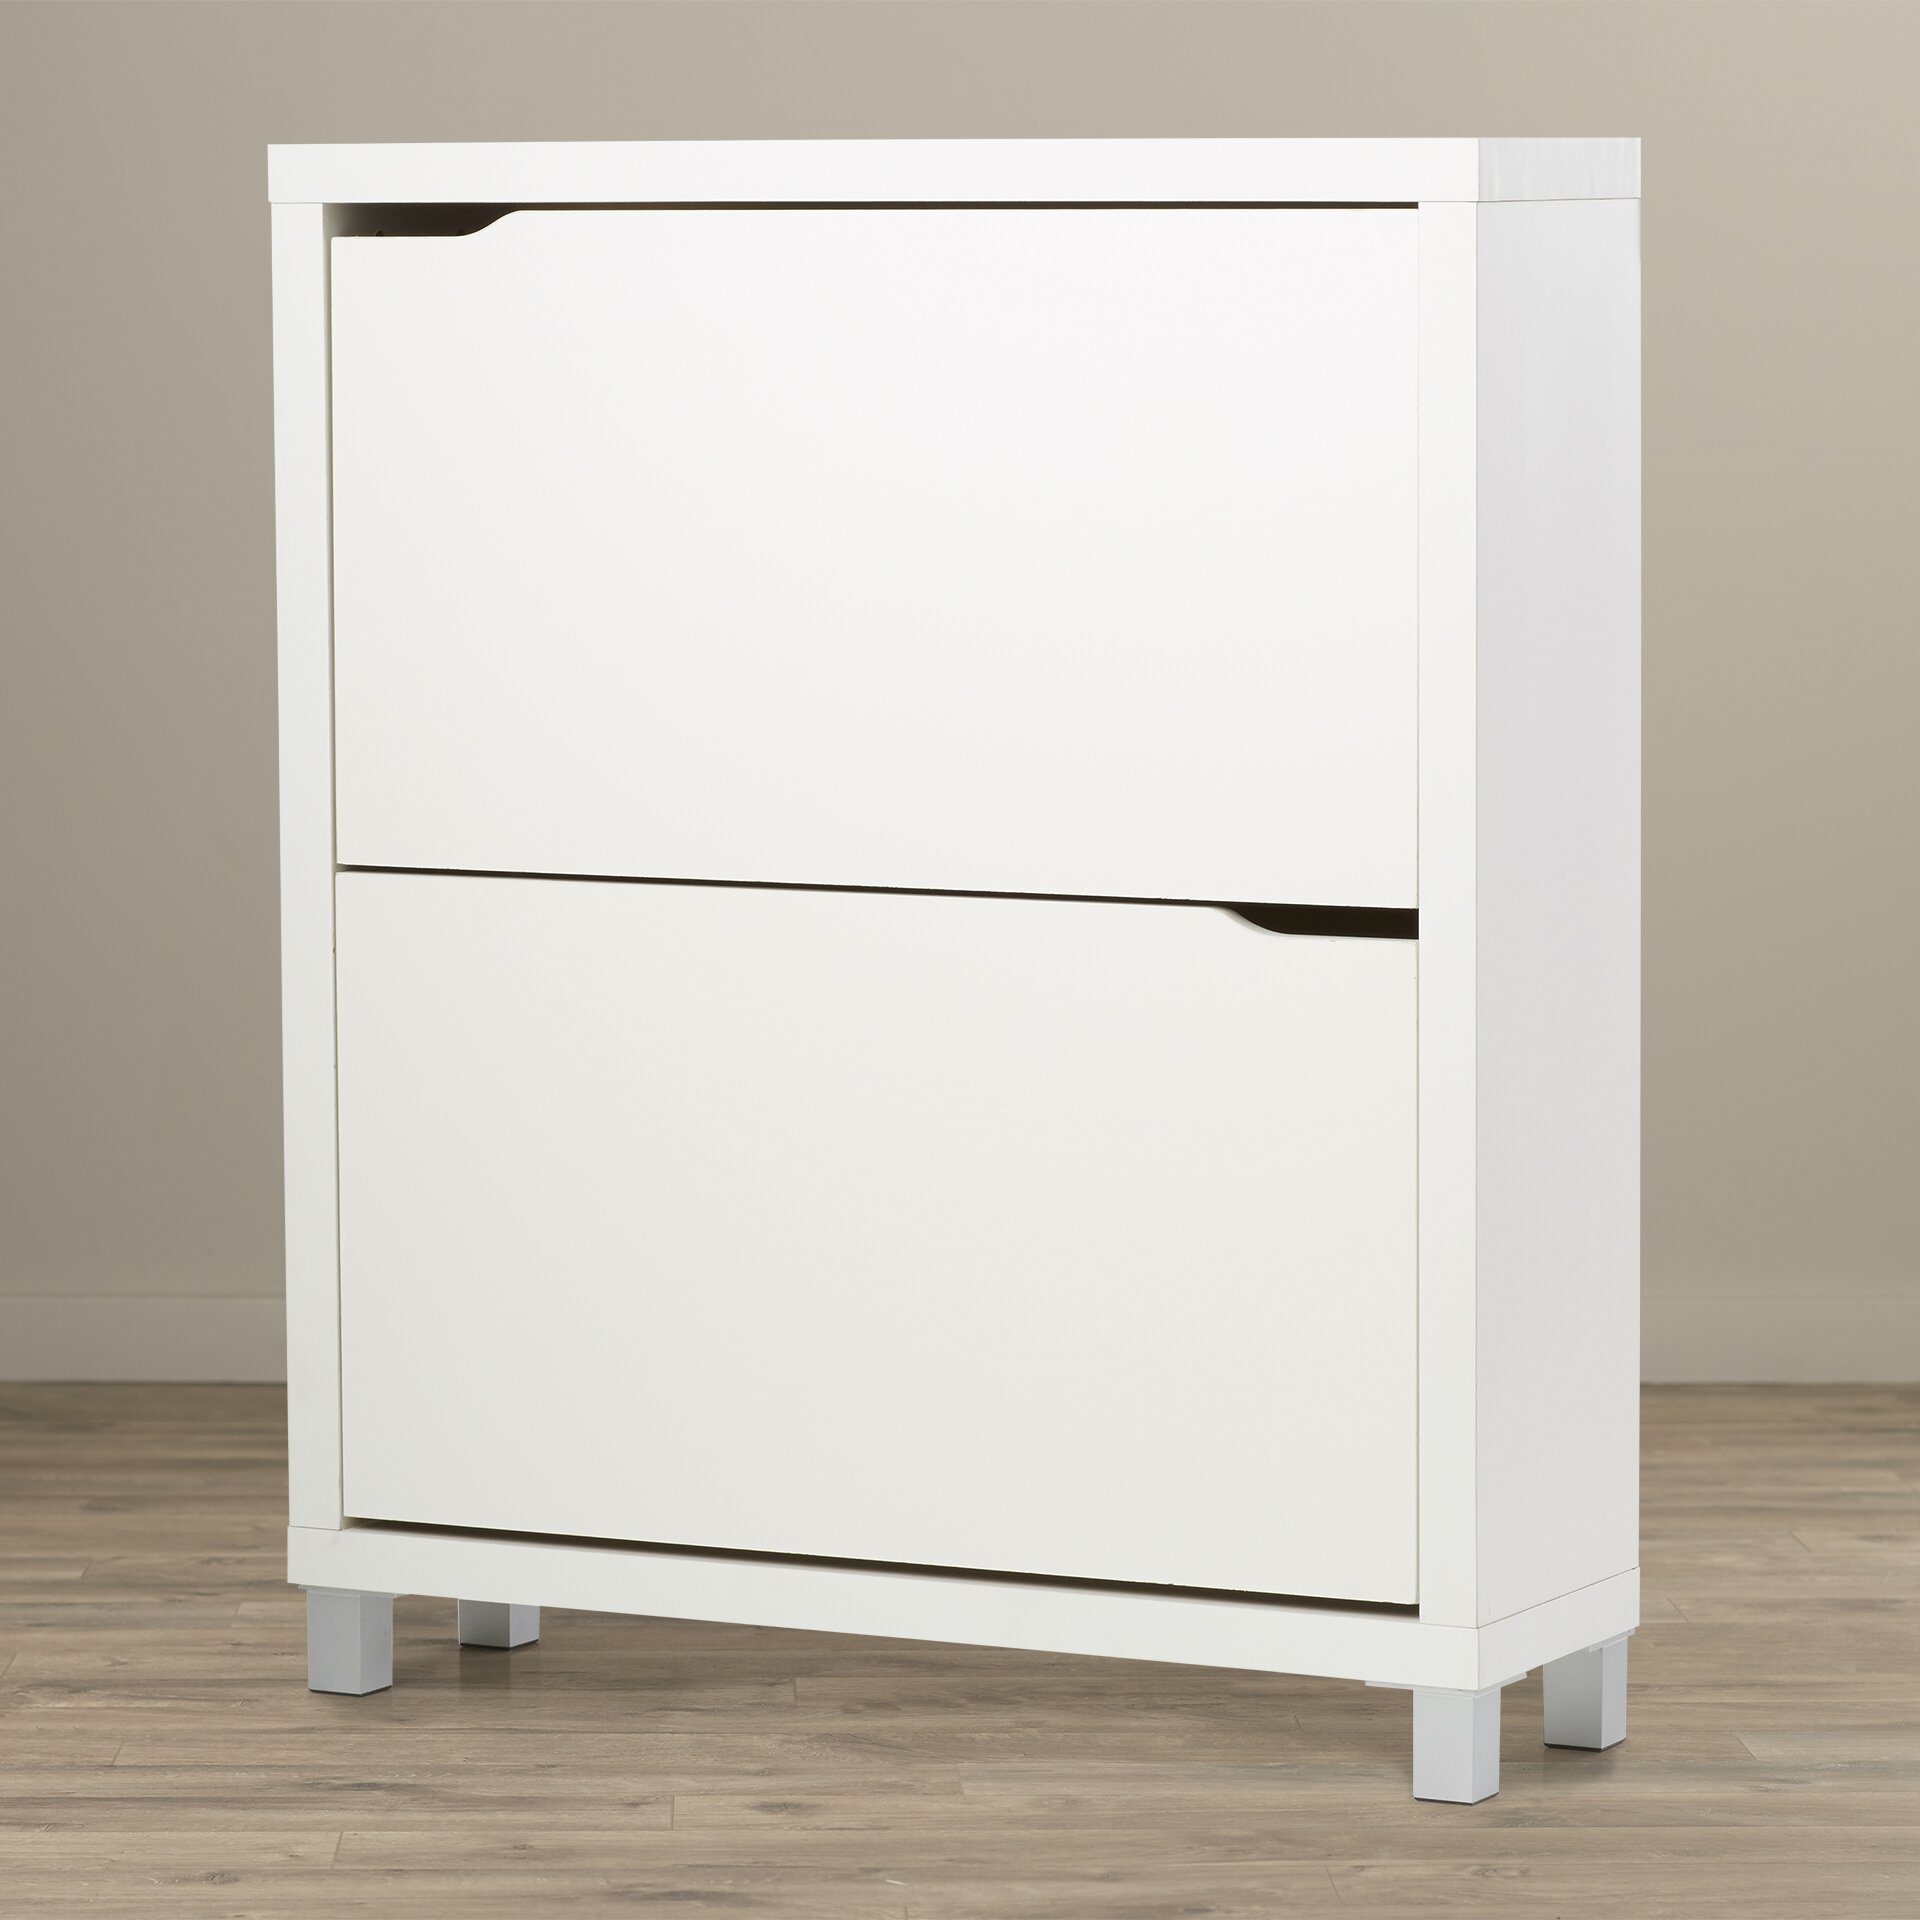 latitude run 12 pair white shoe storage cabinet reviews. Black Bedroom Furniture Sets. Home Design Ideas